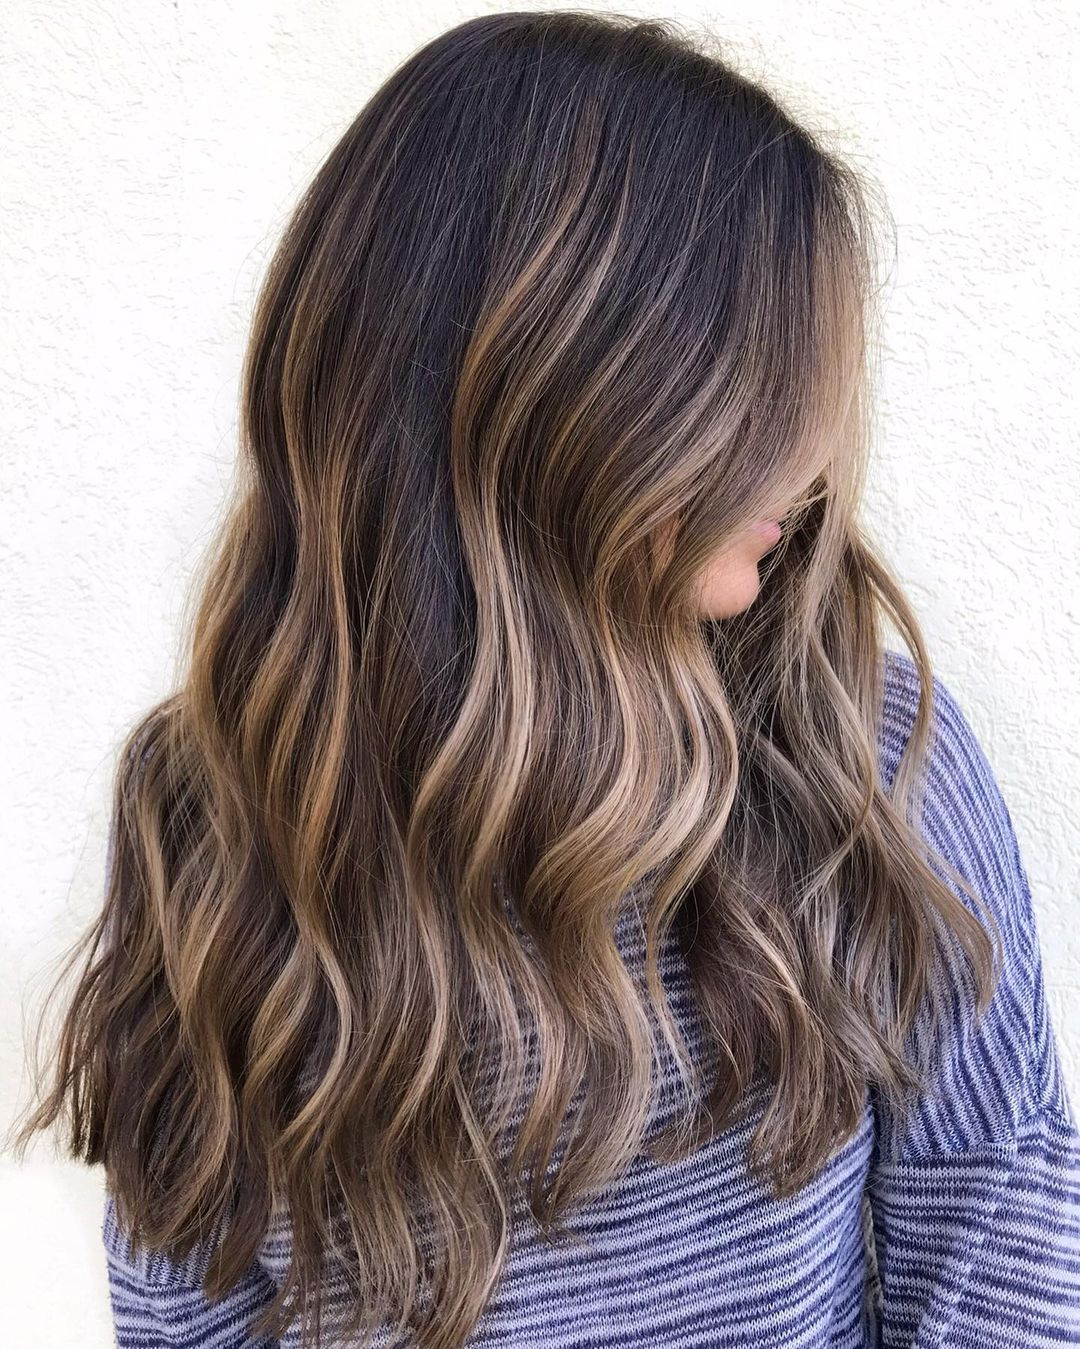 Partial Highlights to Freshen Dark Hair